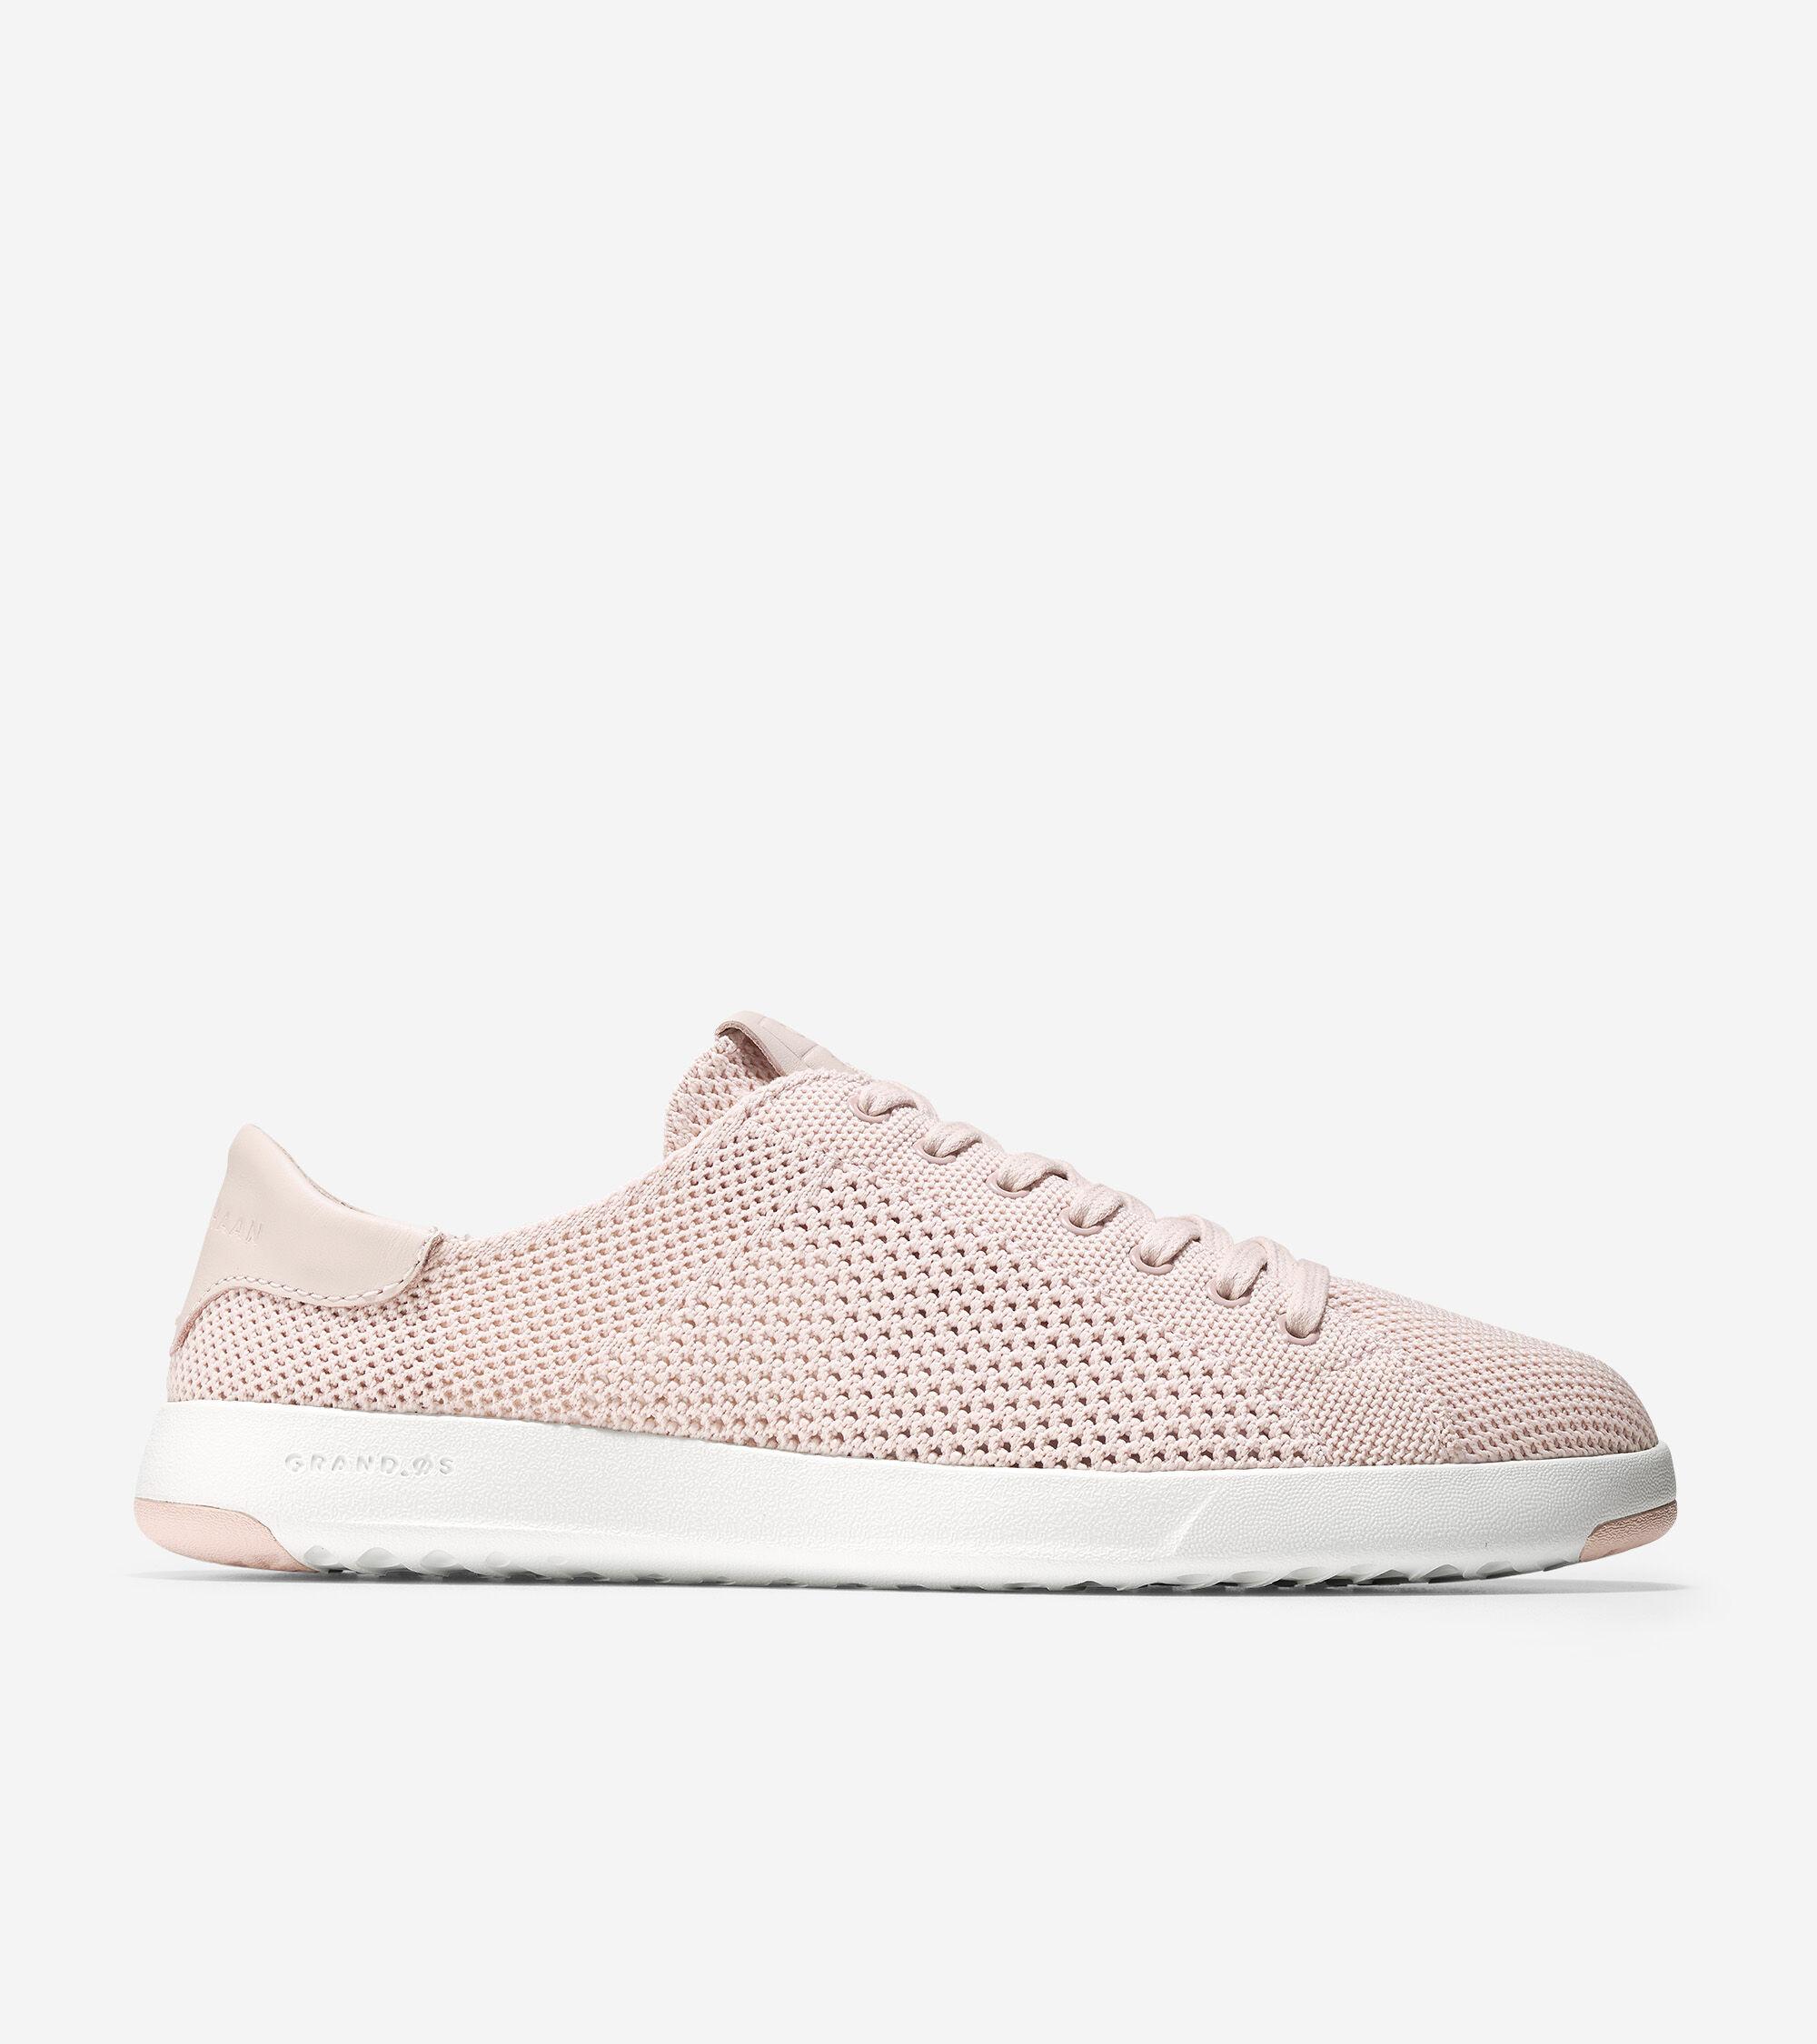 224521910b27ed Women s GrandPro Stitchlite Tennis Sneakers in Peach